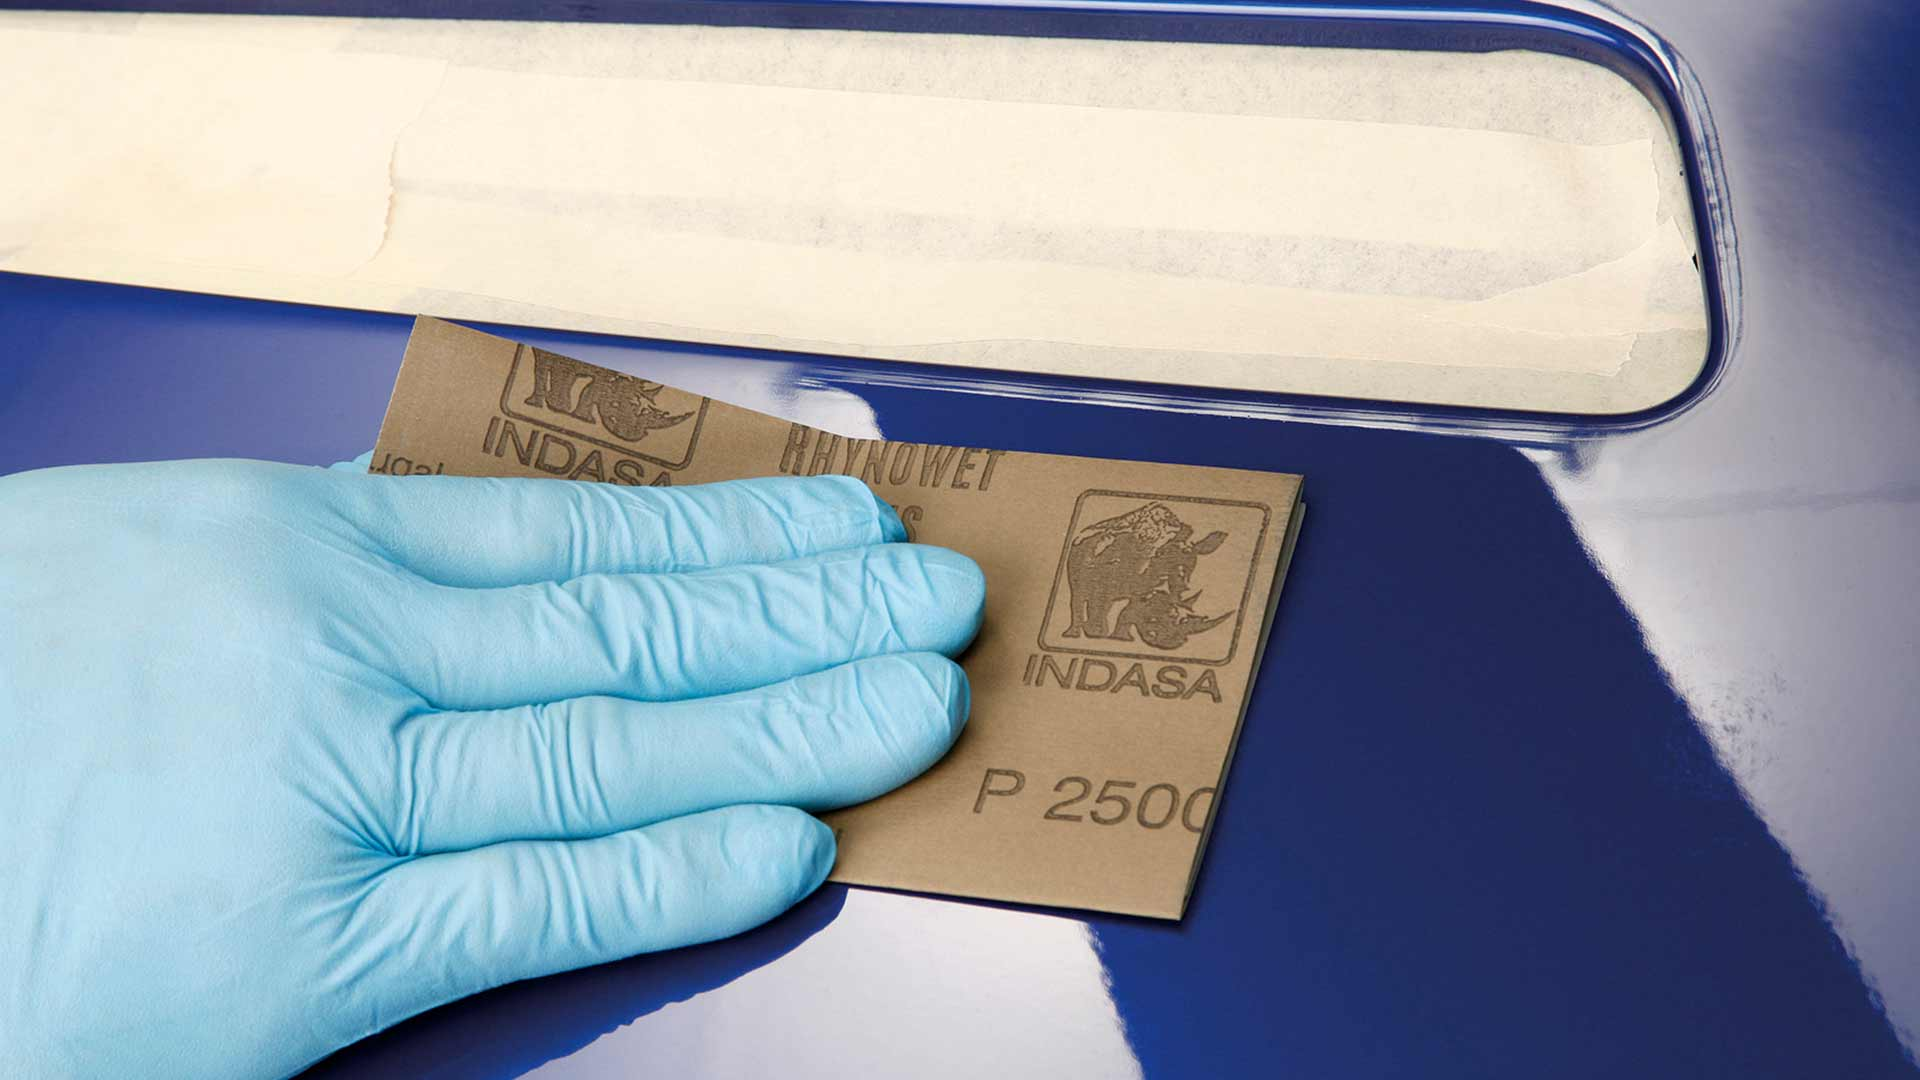 Abrasivos INDASA folha Rhynowet Plus Line a lixar superfície azul